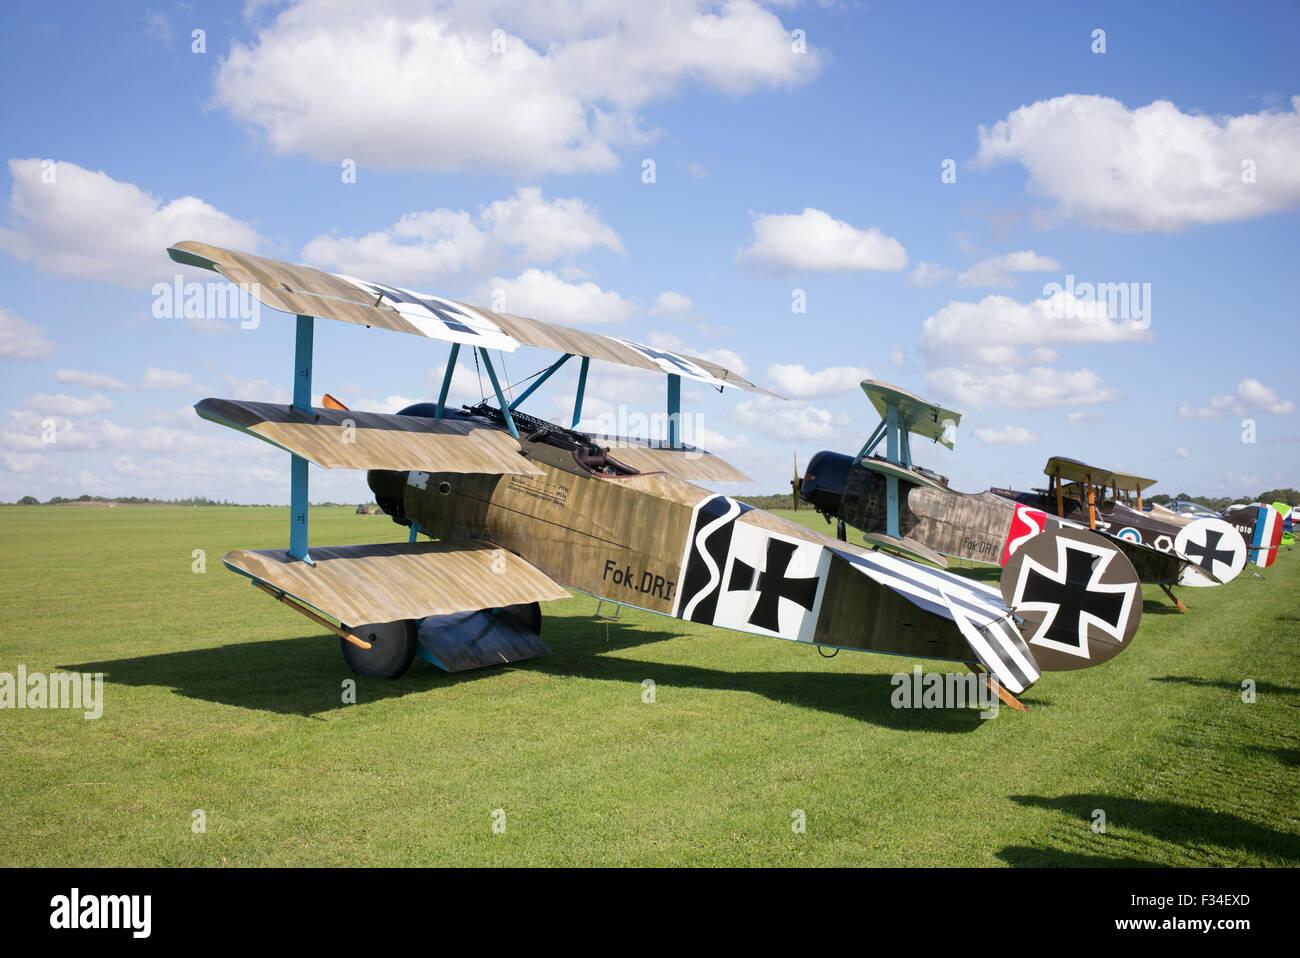 Fokker Dr.I Triplane replicas at Sywell Aerodrome, Northampton, England - Stock Image